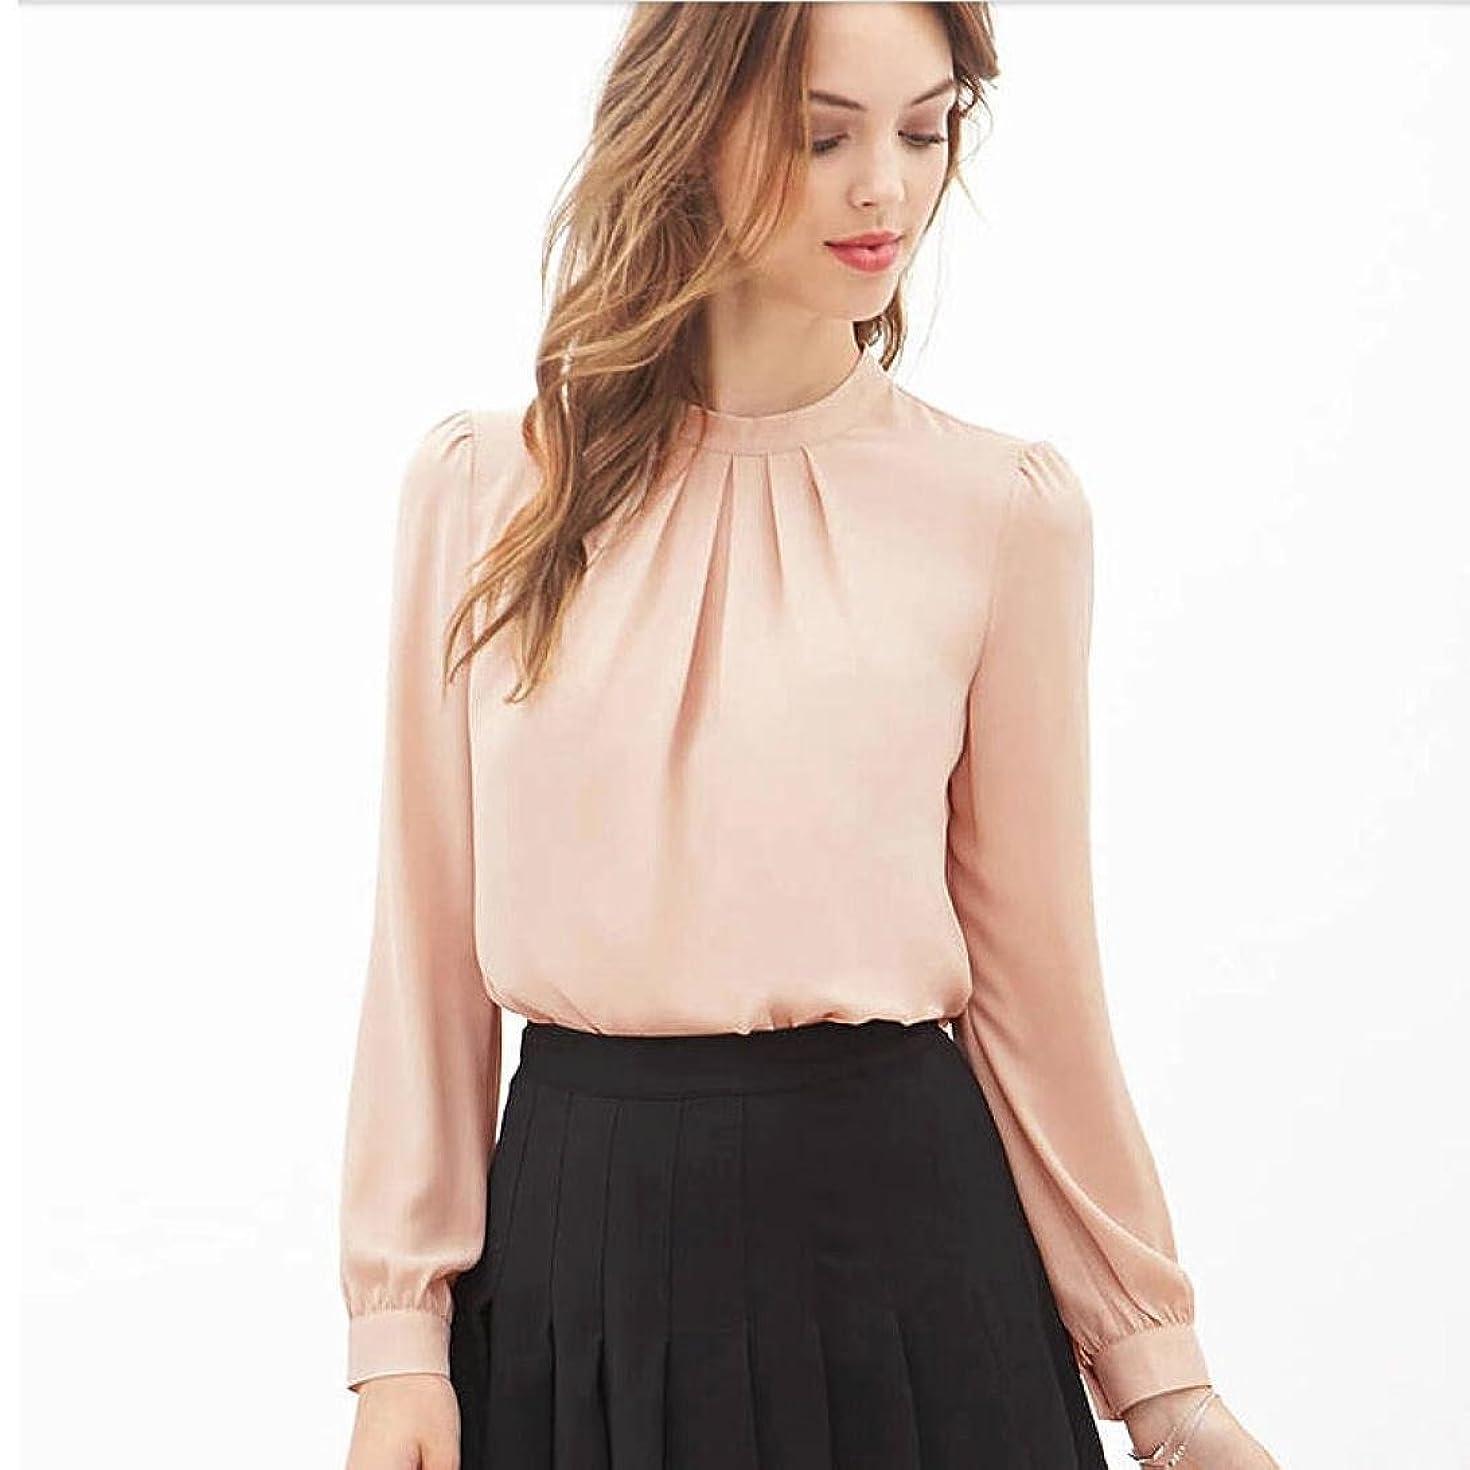 Hemlock Office Chiffon Shirts Women Long Sleeves Tops Shirts O-Neck Spring Blouse (S, Pink)